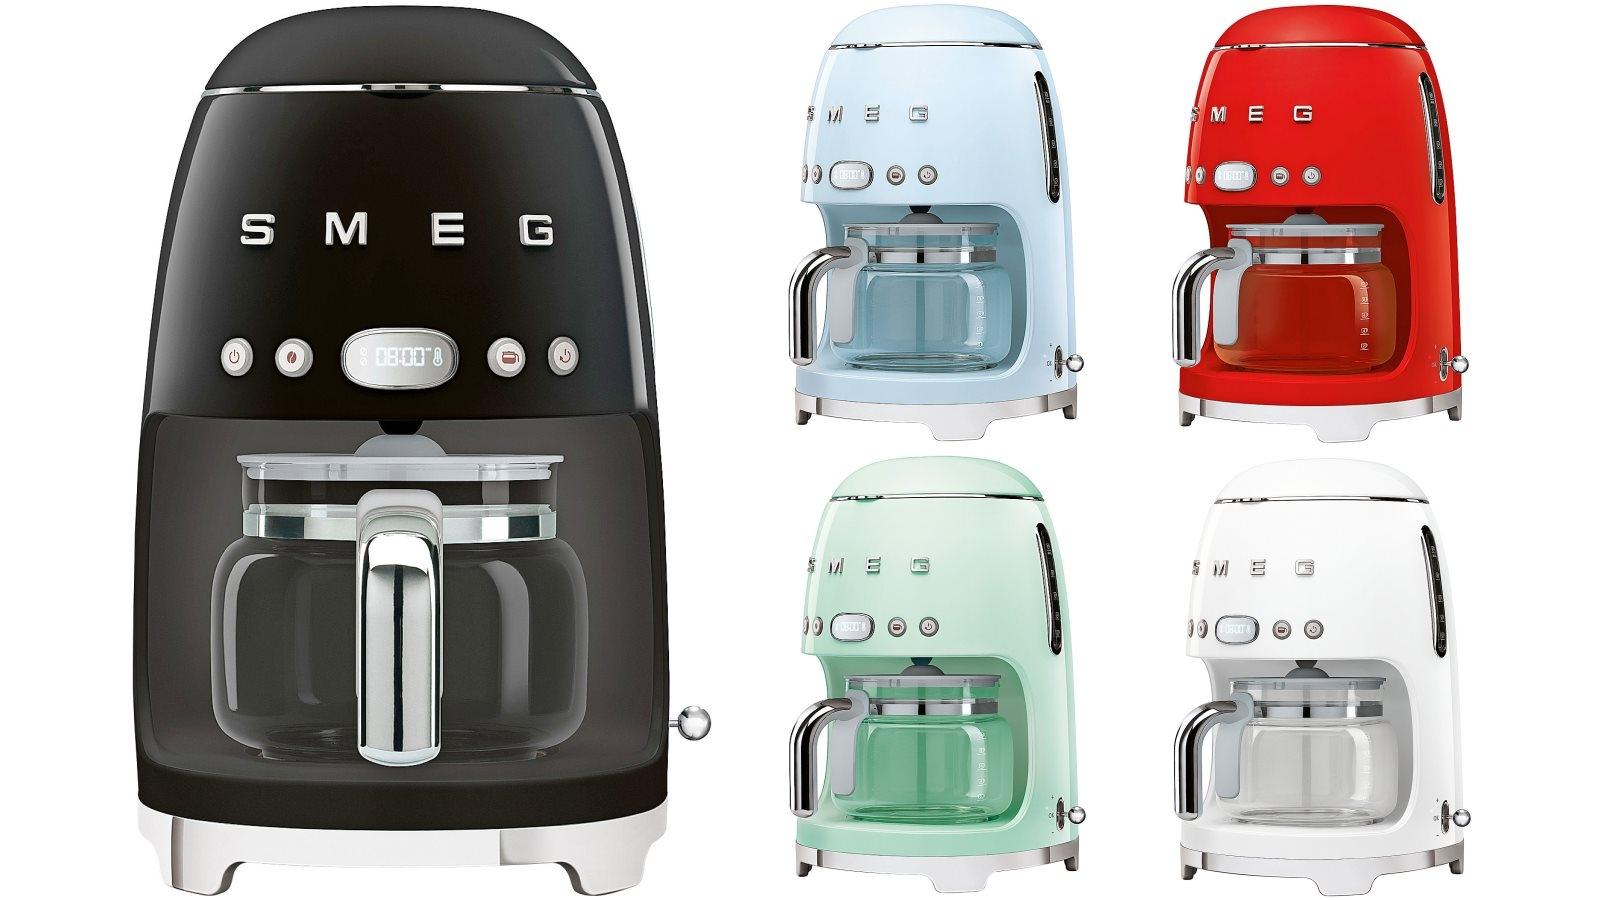 Image of Smeg 50's Retro Style Aesthetic Drip Filter Coffee Machine